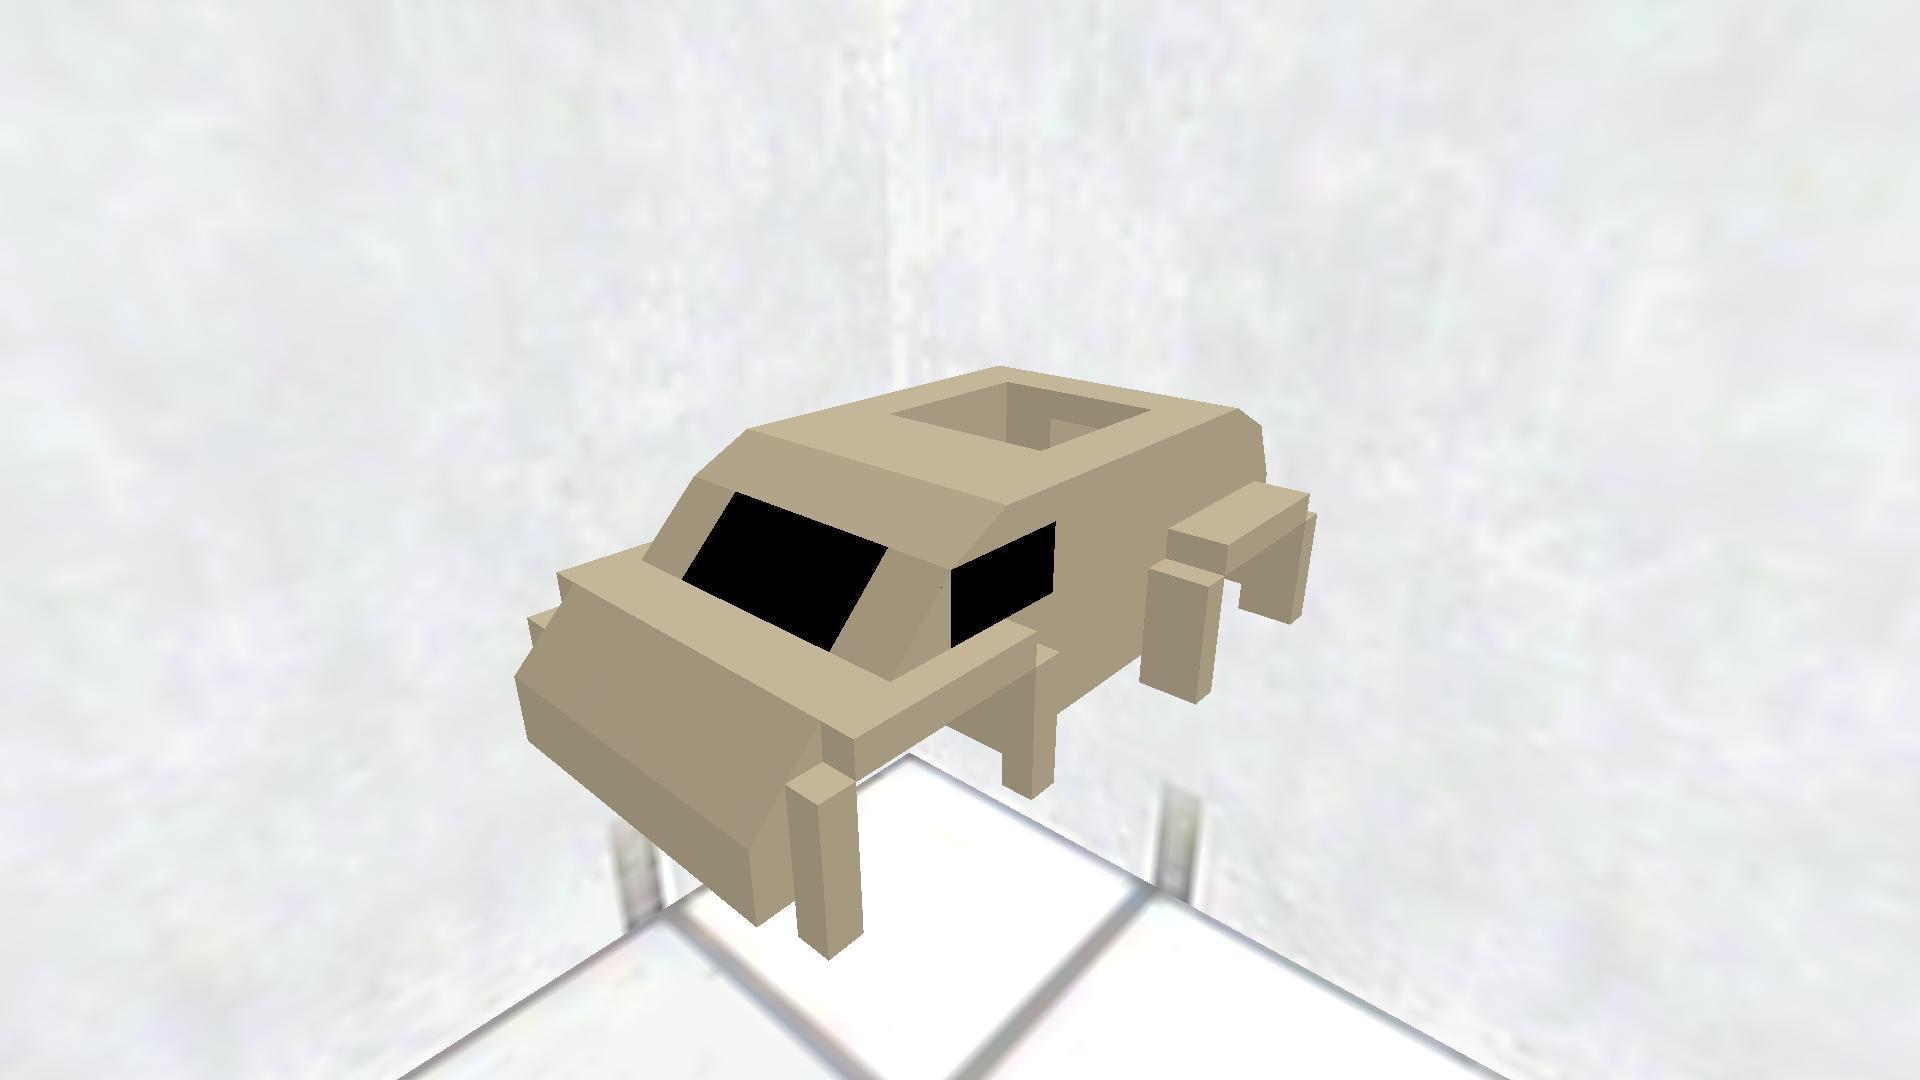 Desert humvee frame